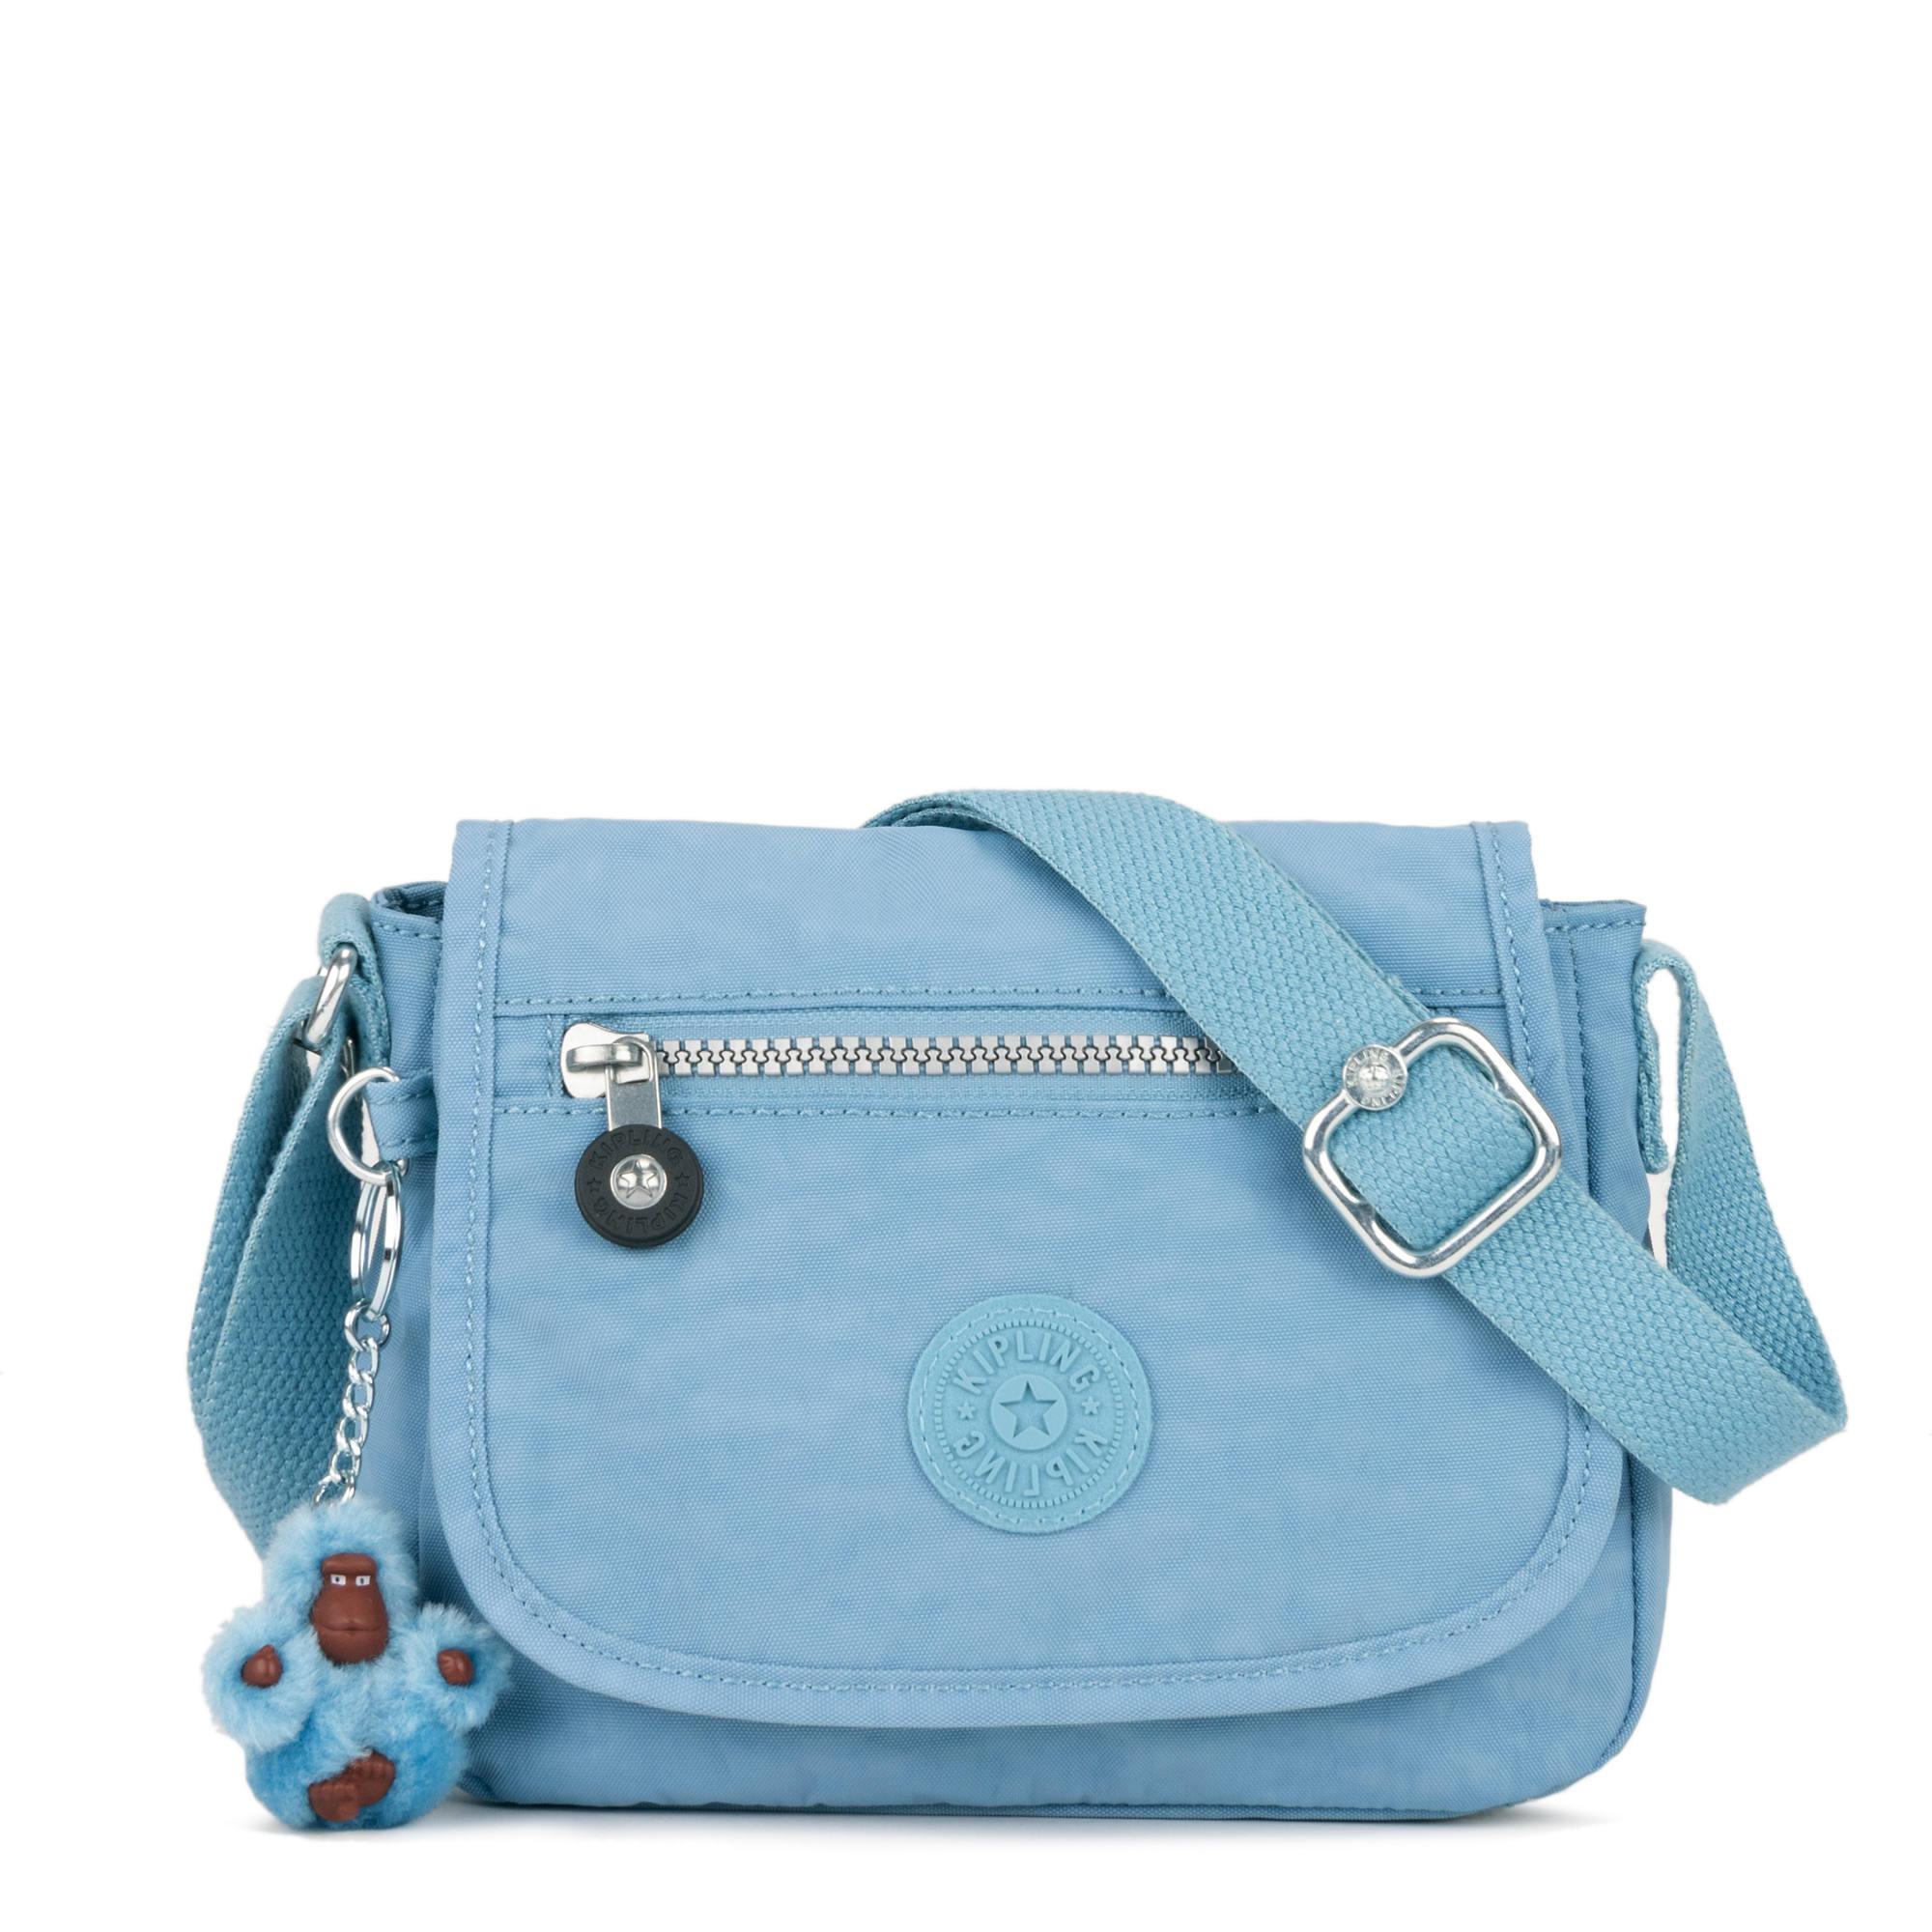 eb0eef5eada6e Sabian Crossbody Minibag